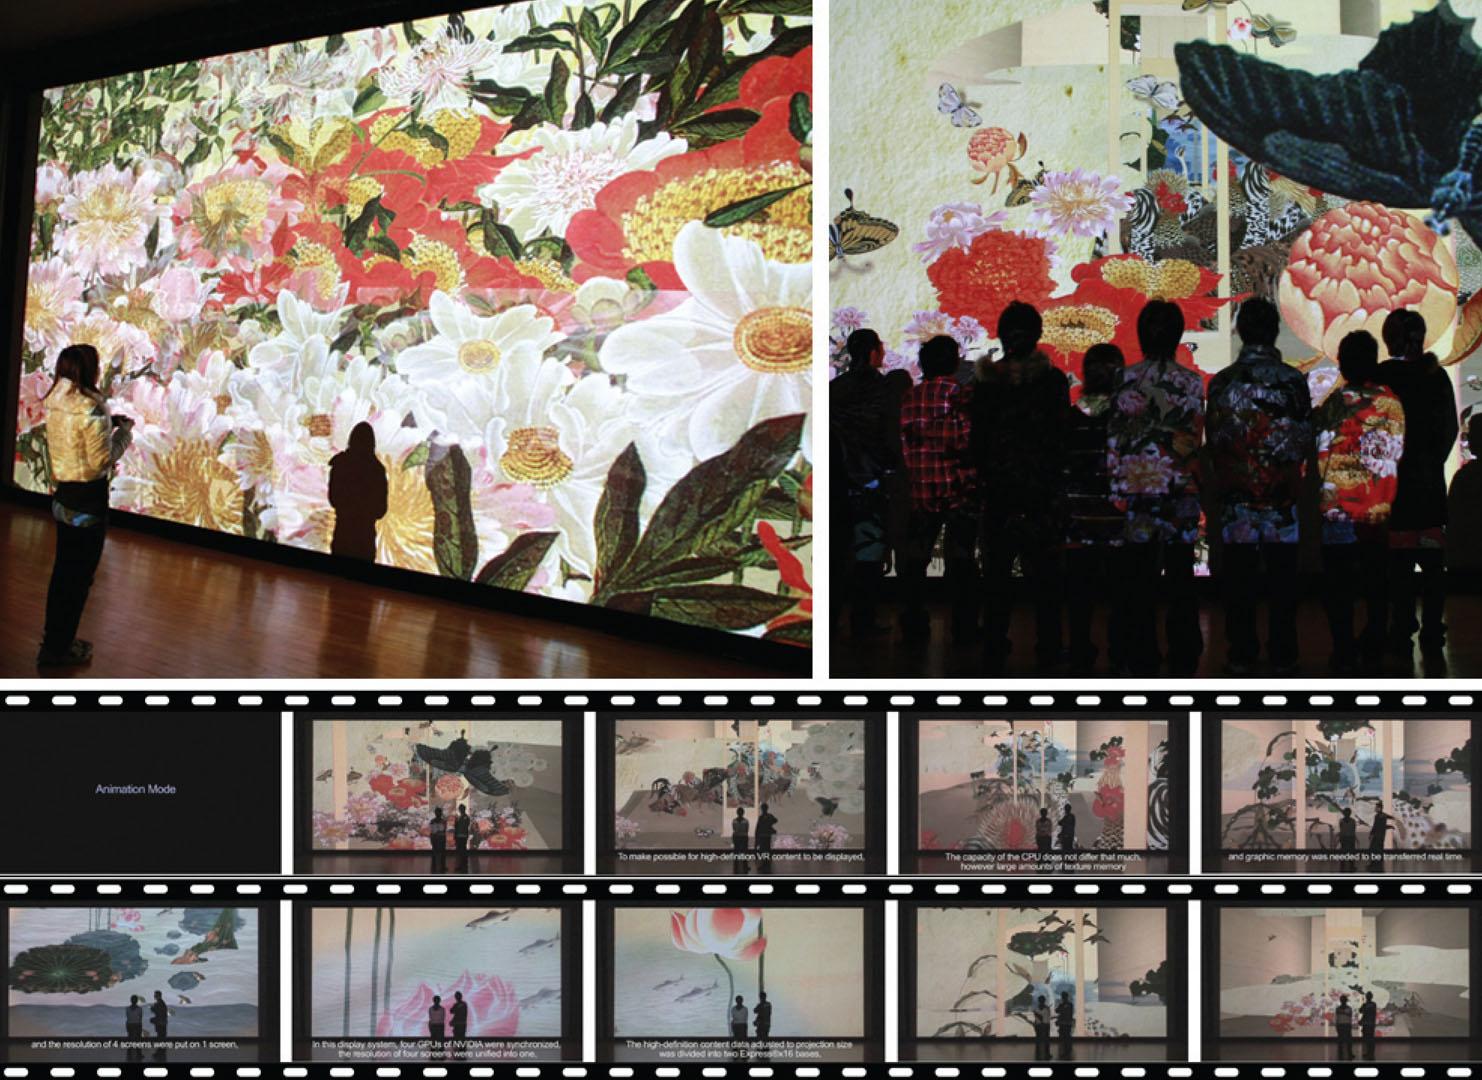 ©, Sangtae Kim, Analysis and Understanding of Paintings by Ito Jakuchu